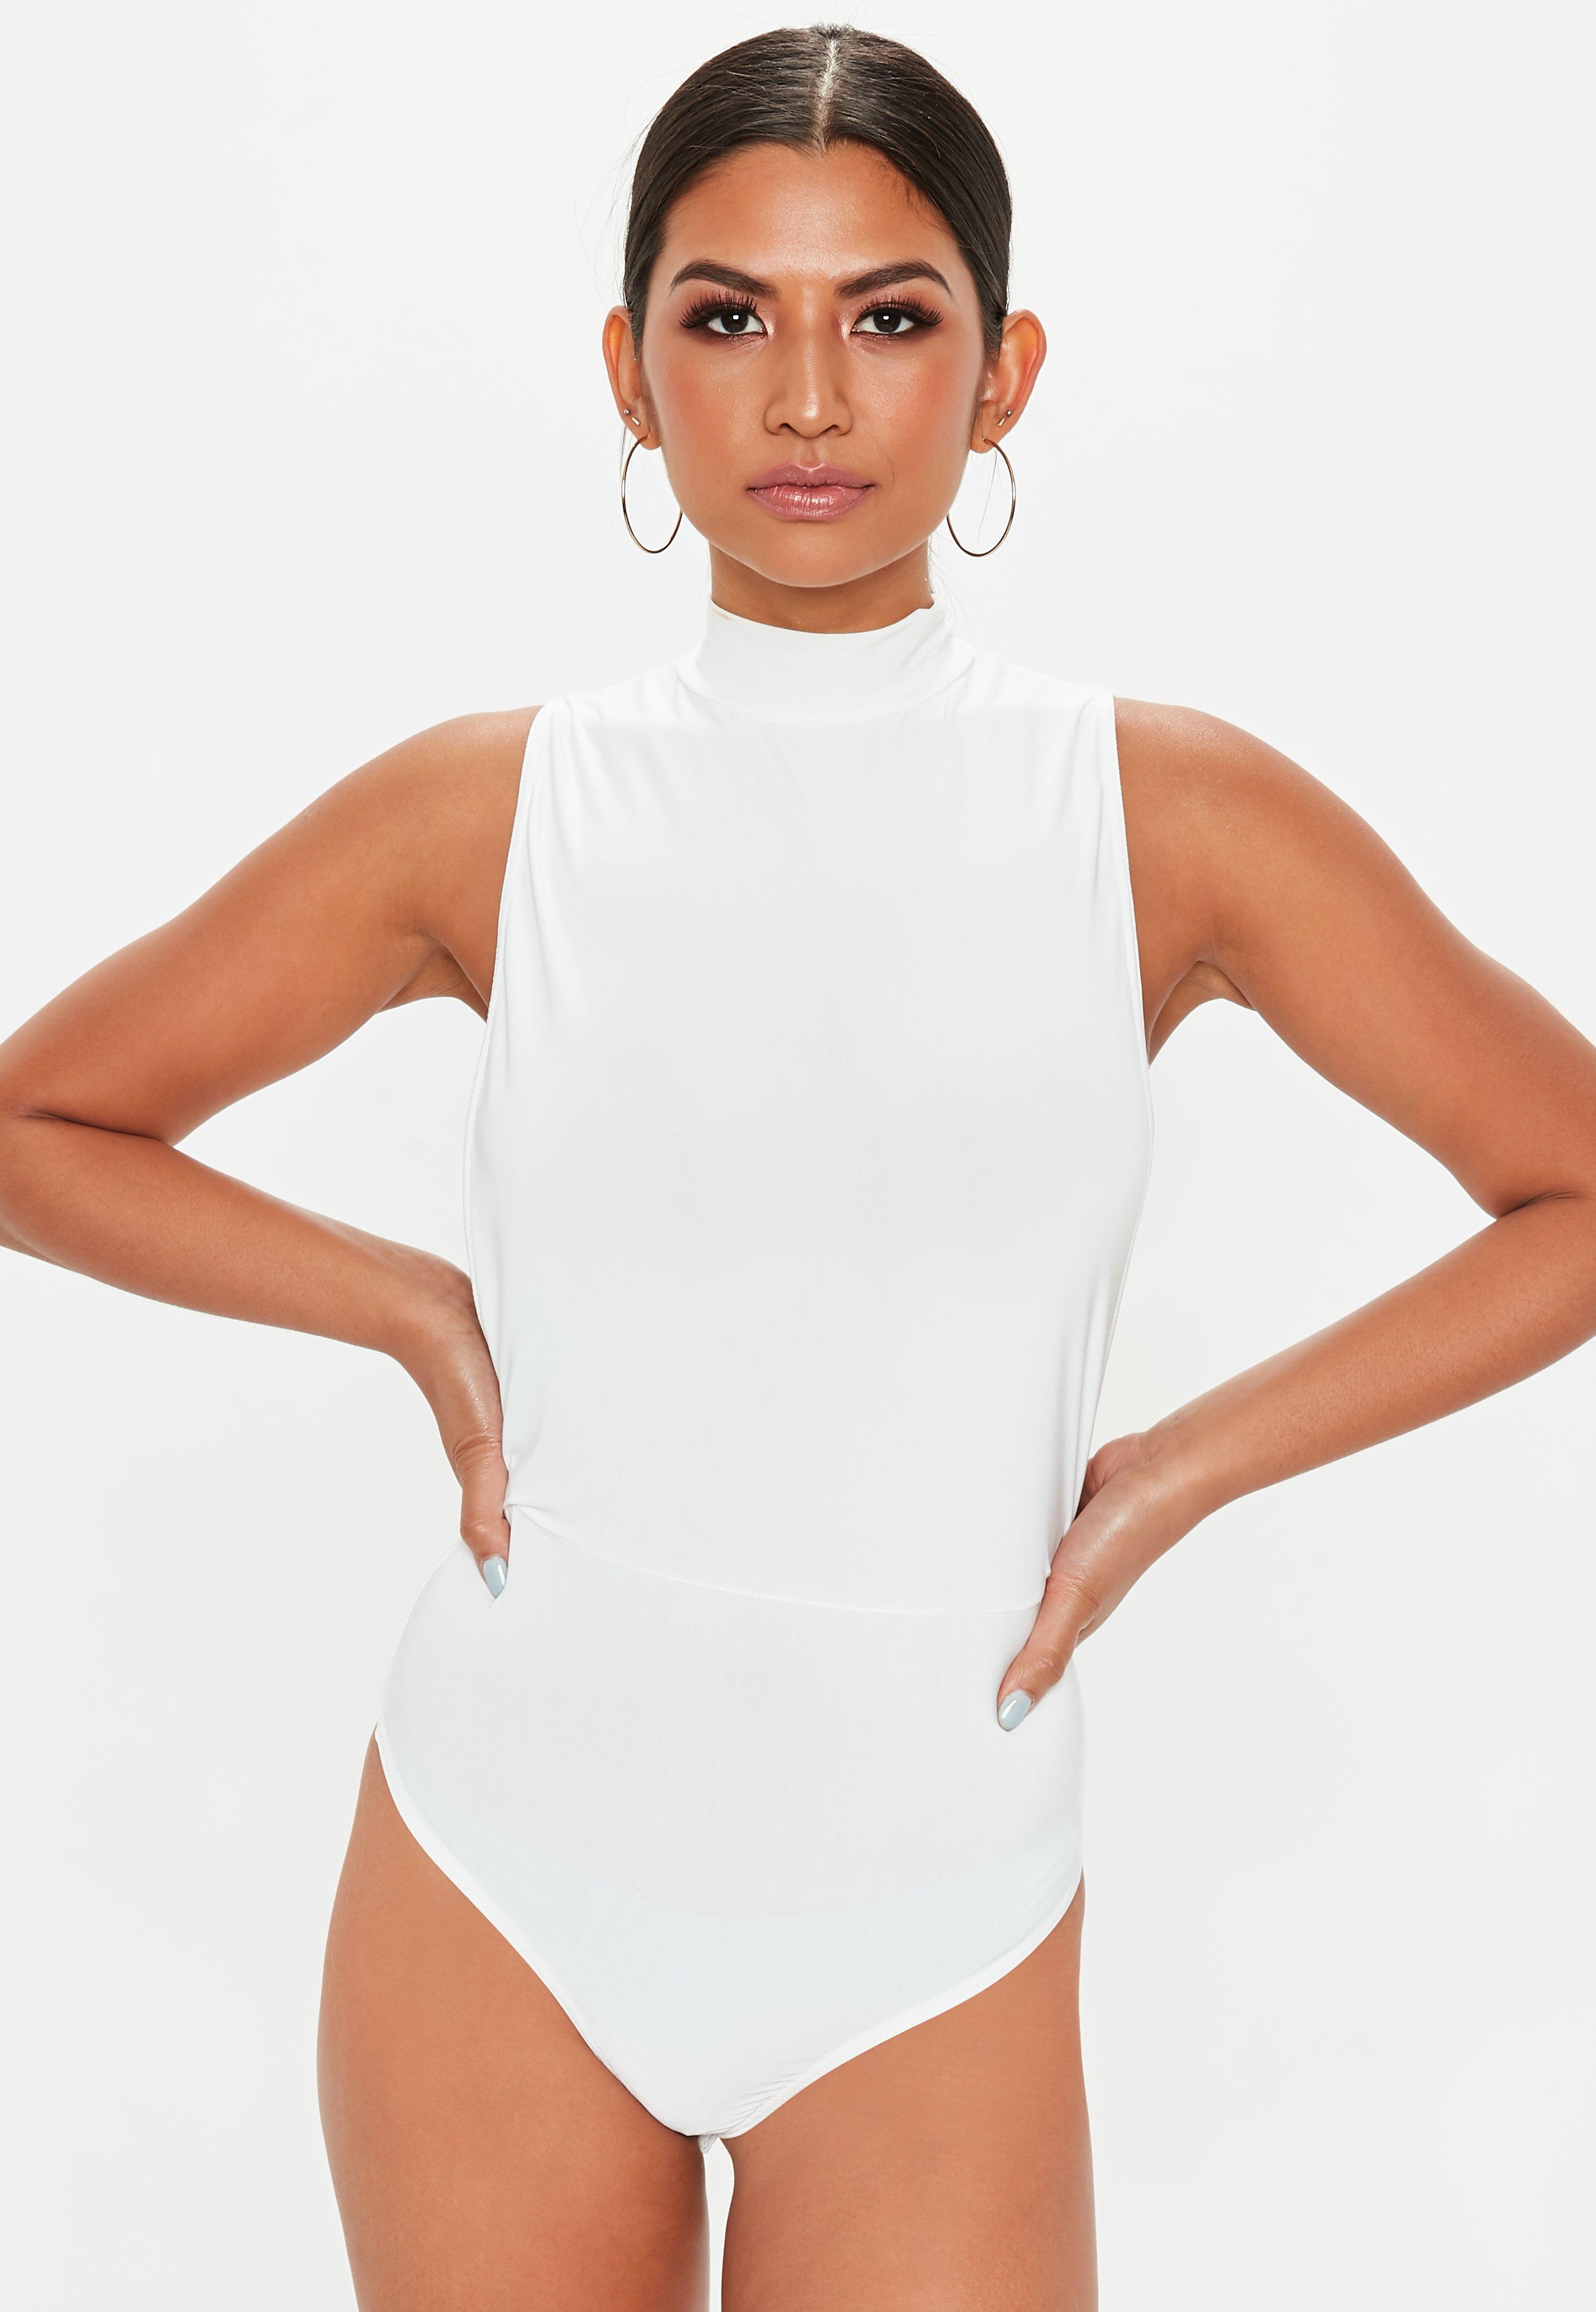 Lyst - Missguided White High Neck Side Boob Slinky Bodysuit in White d24f5eb51